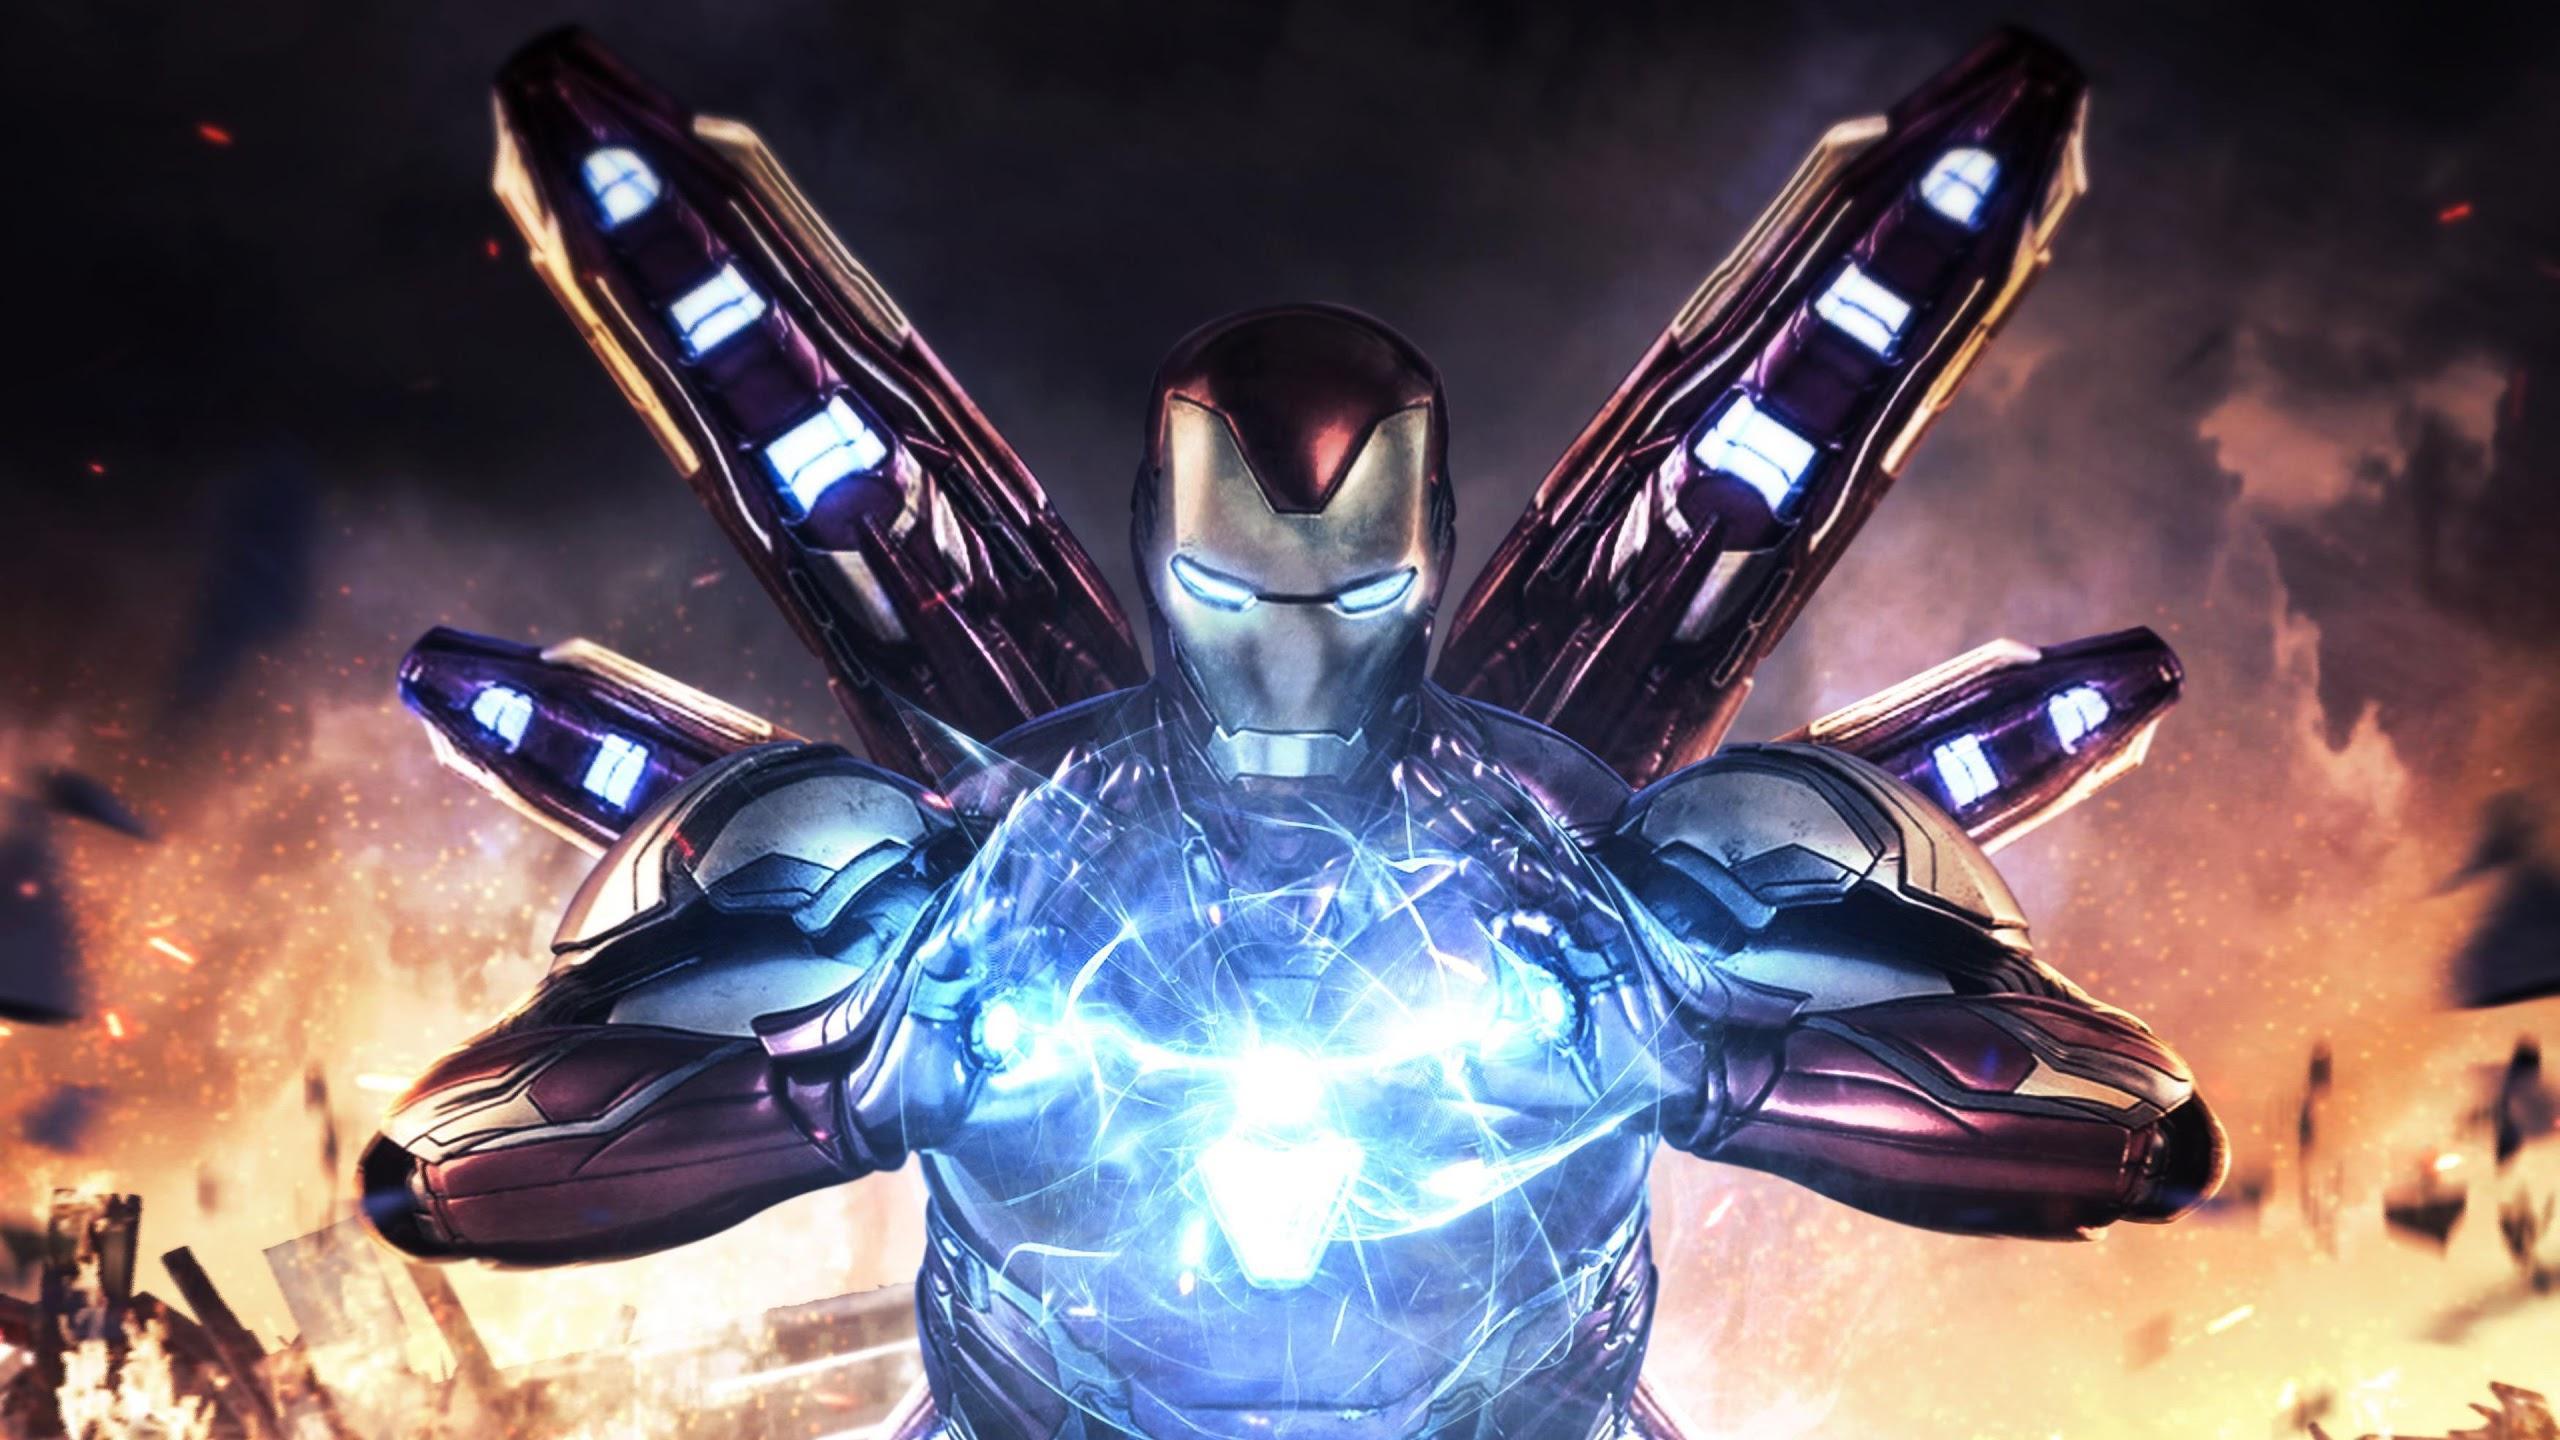 Iron Man Wallpaper 2560x1440